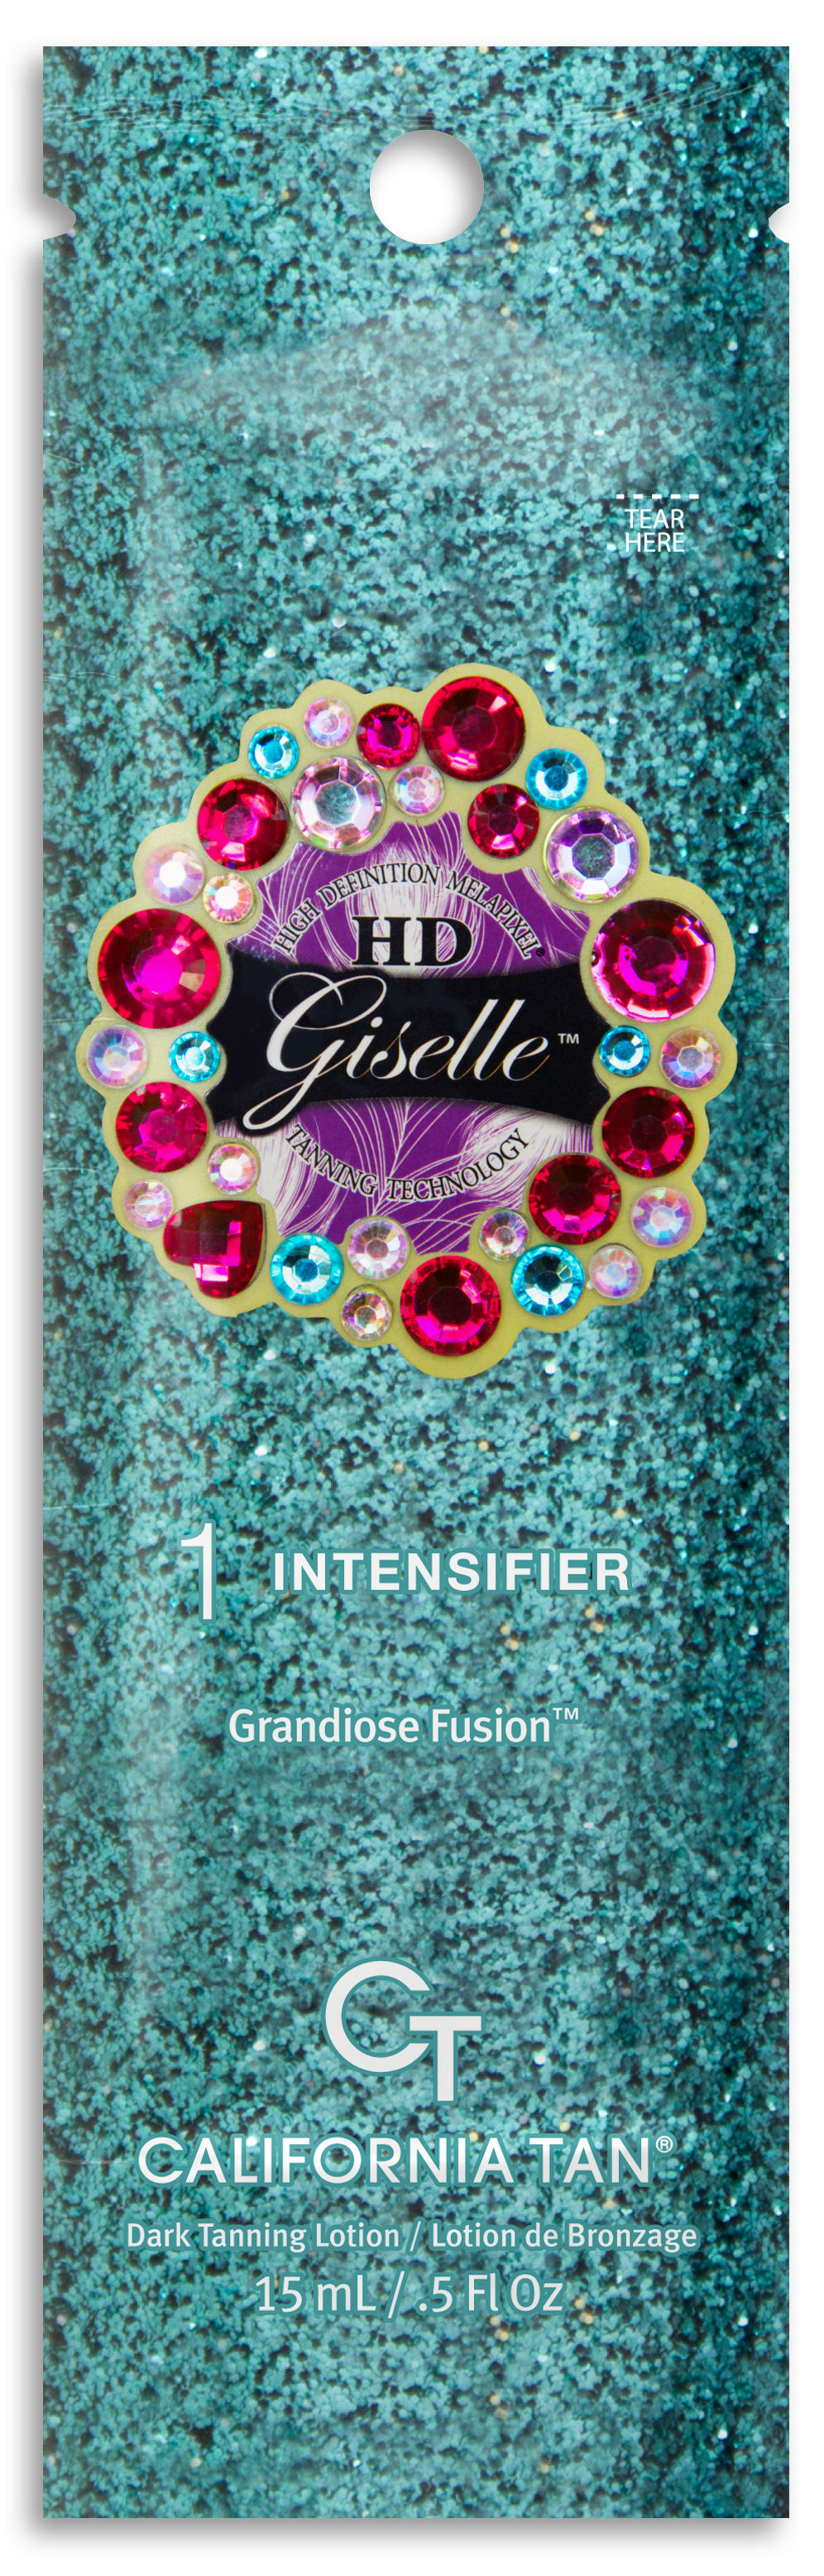 HD Giselle™ Pkt